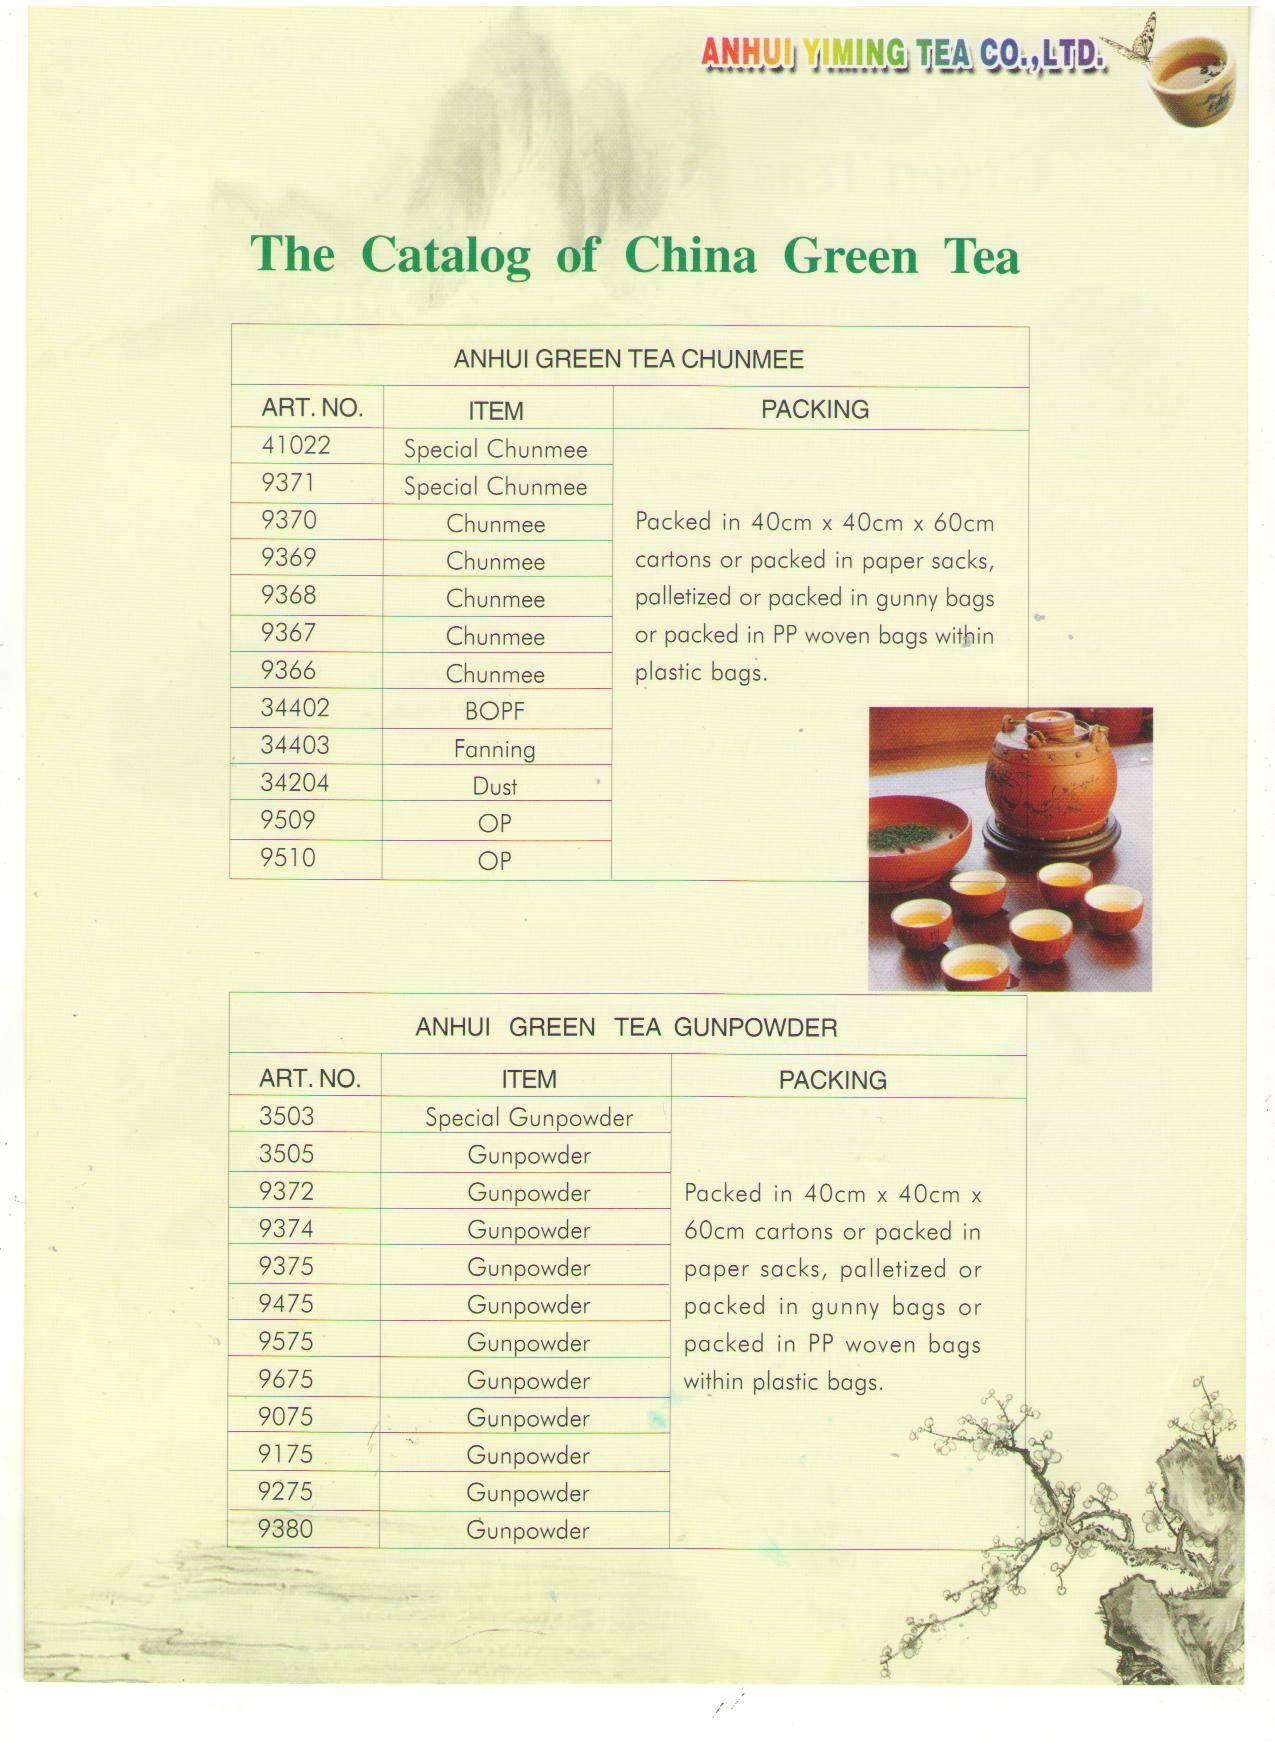 China Green tea  Chunmee 9371